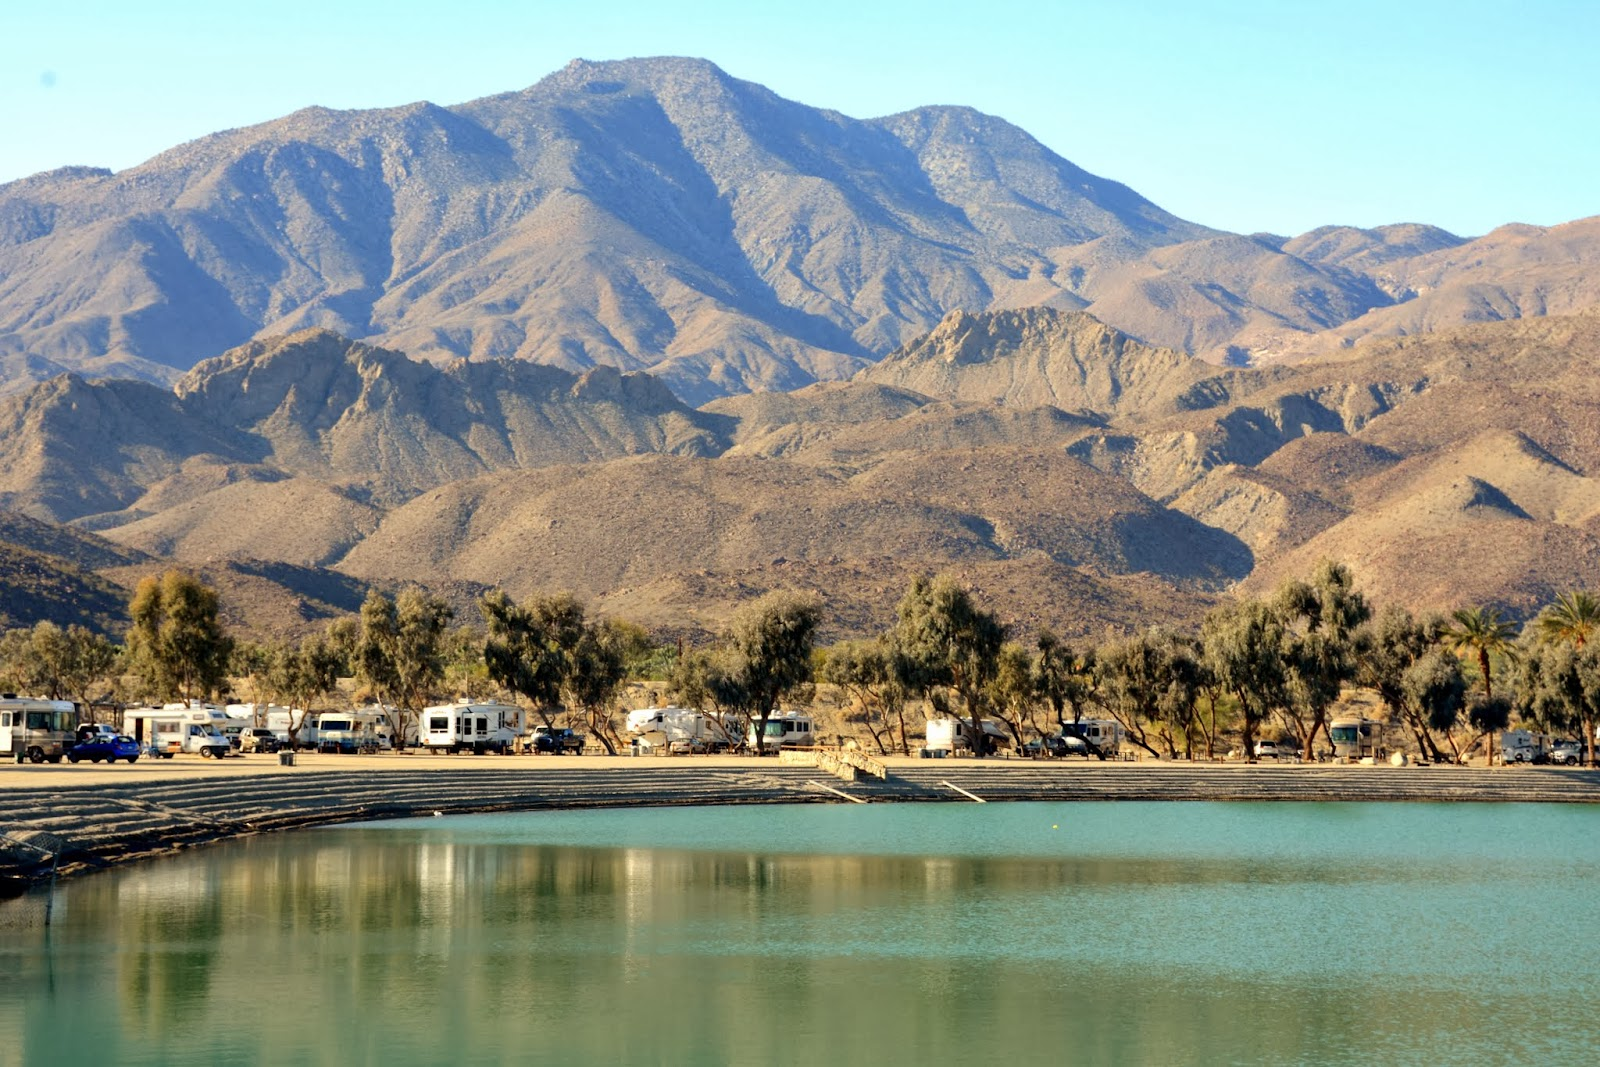 Stillhowlyntravels Our Week At Lake Cahuilla